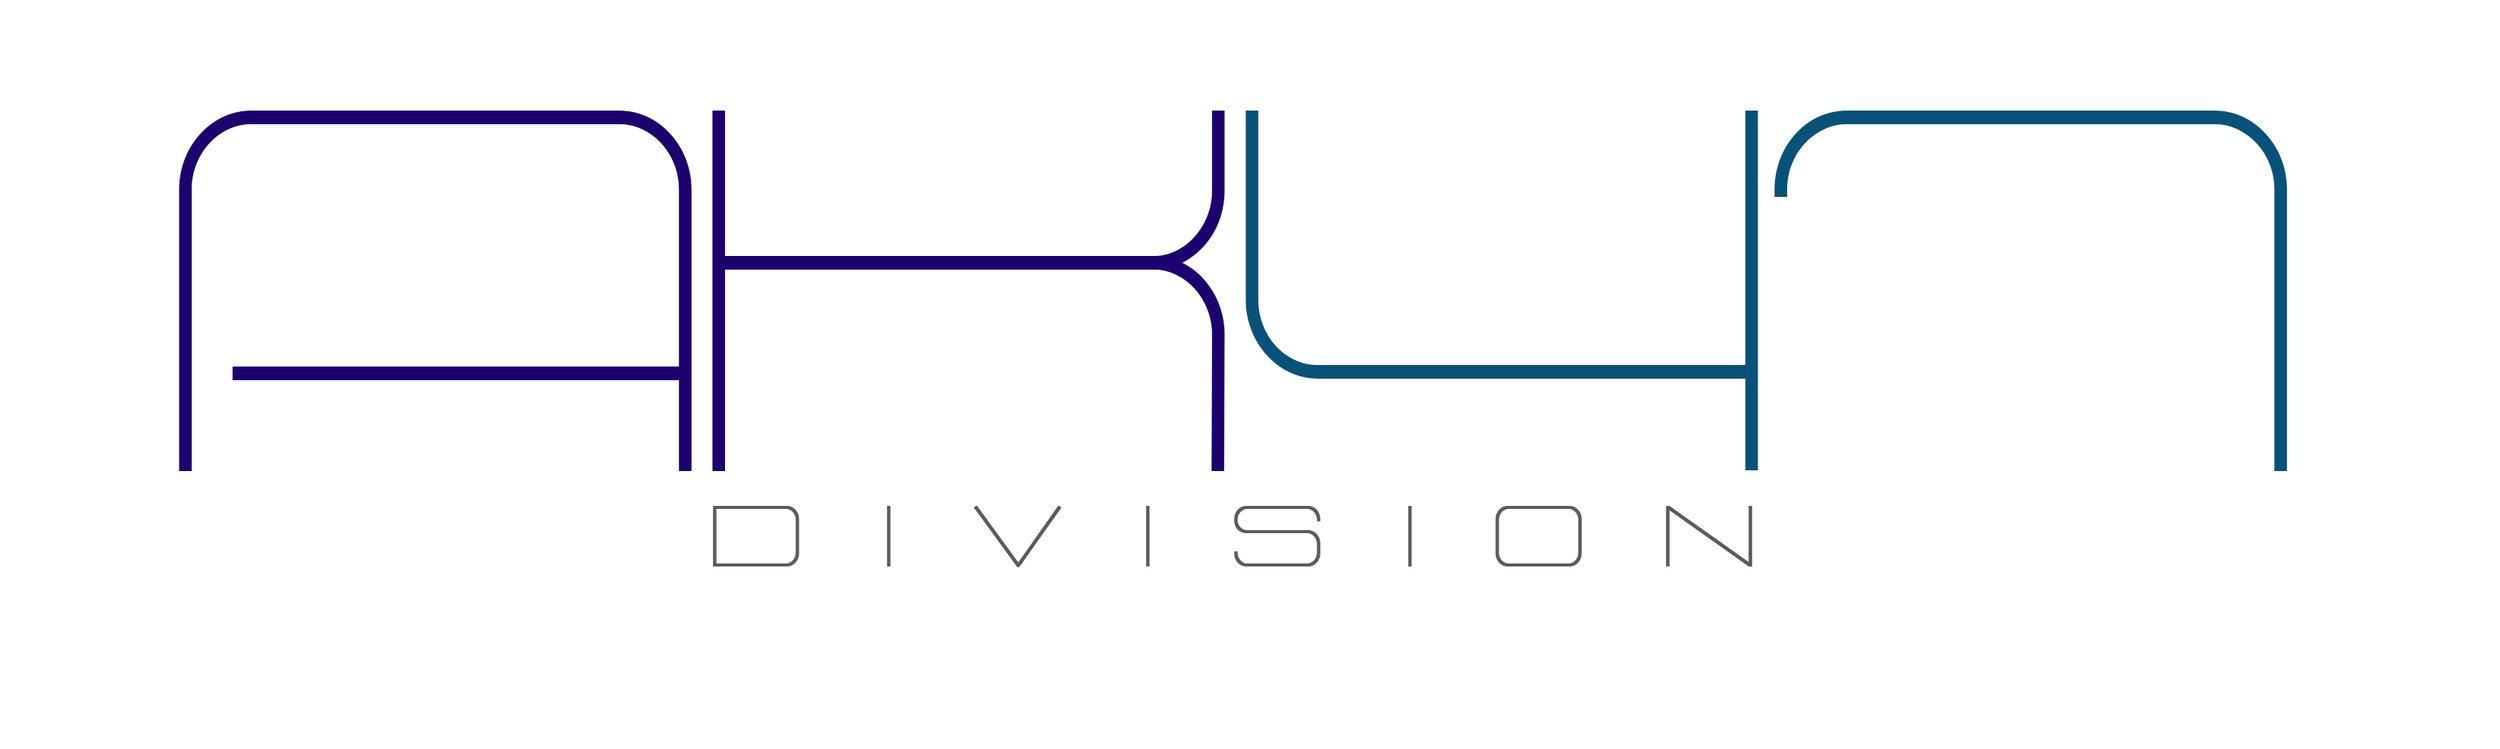 ak47division logo.jpg